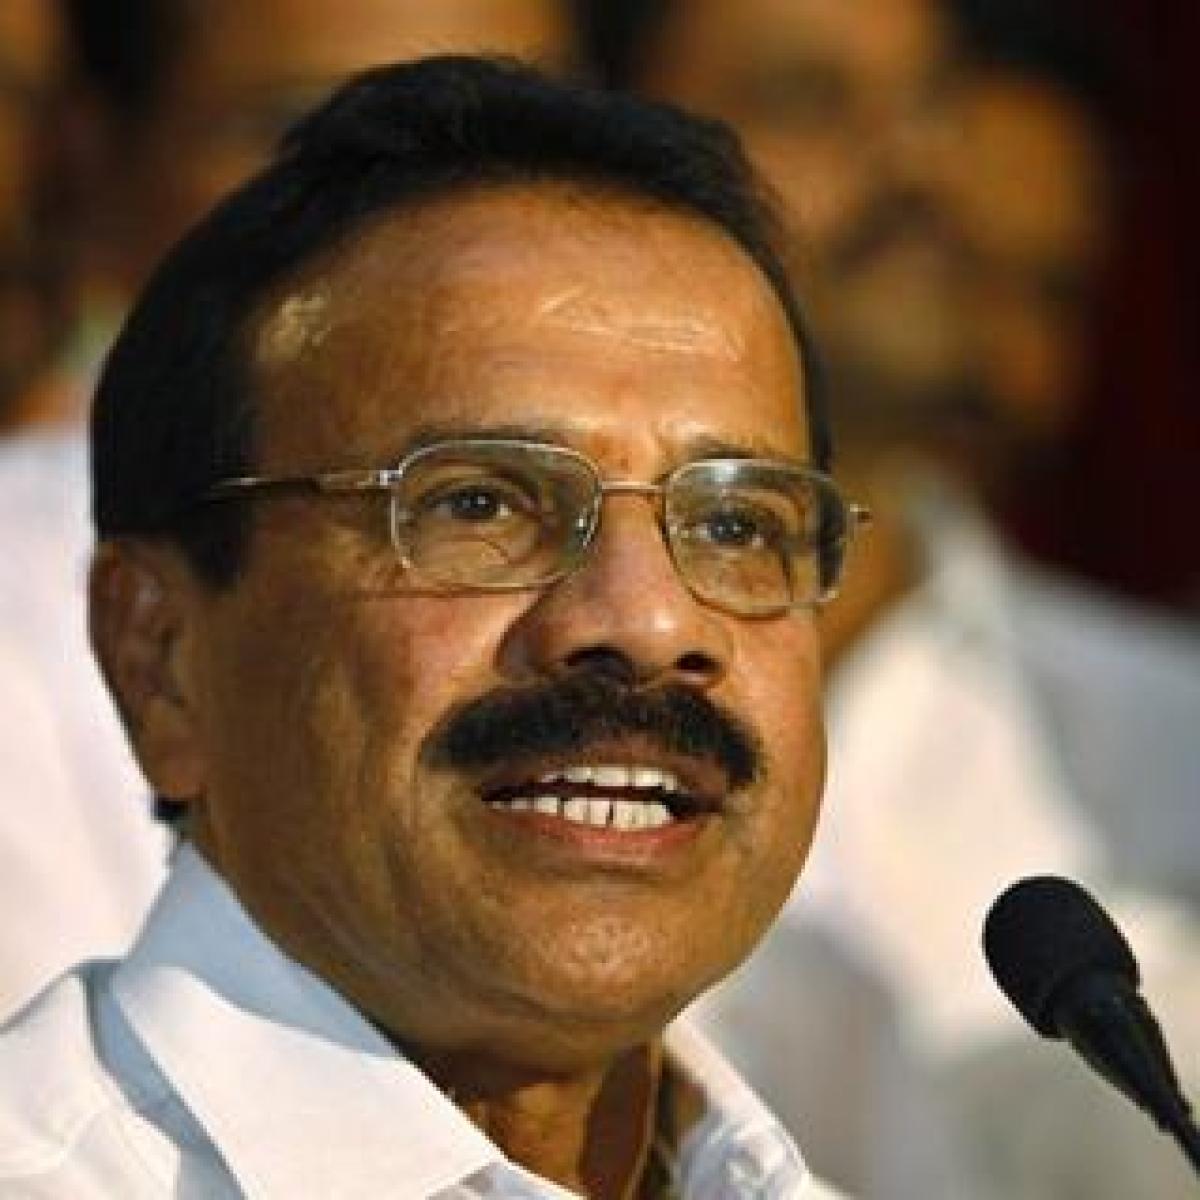 No quarantine rules for ministers? BJP's Sadananda Gowda skips quarantine after his return from Delhi